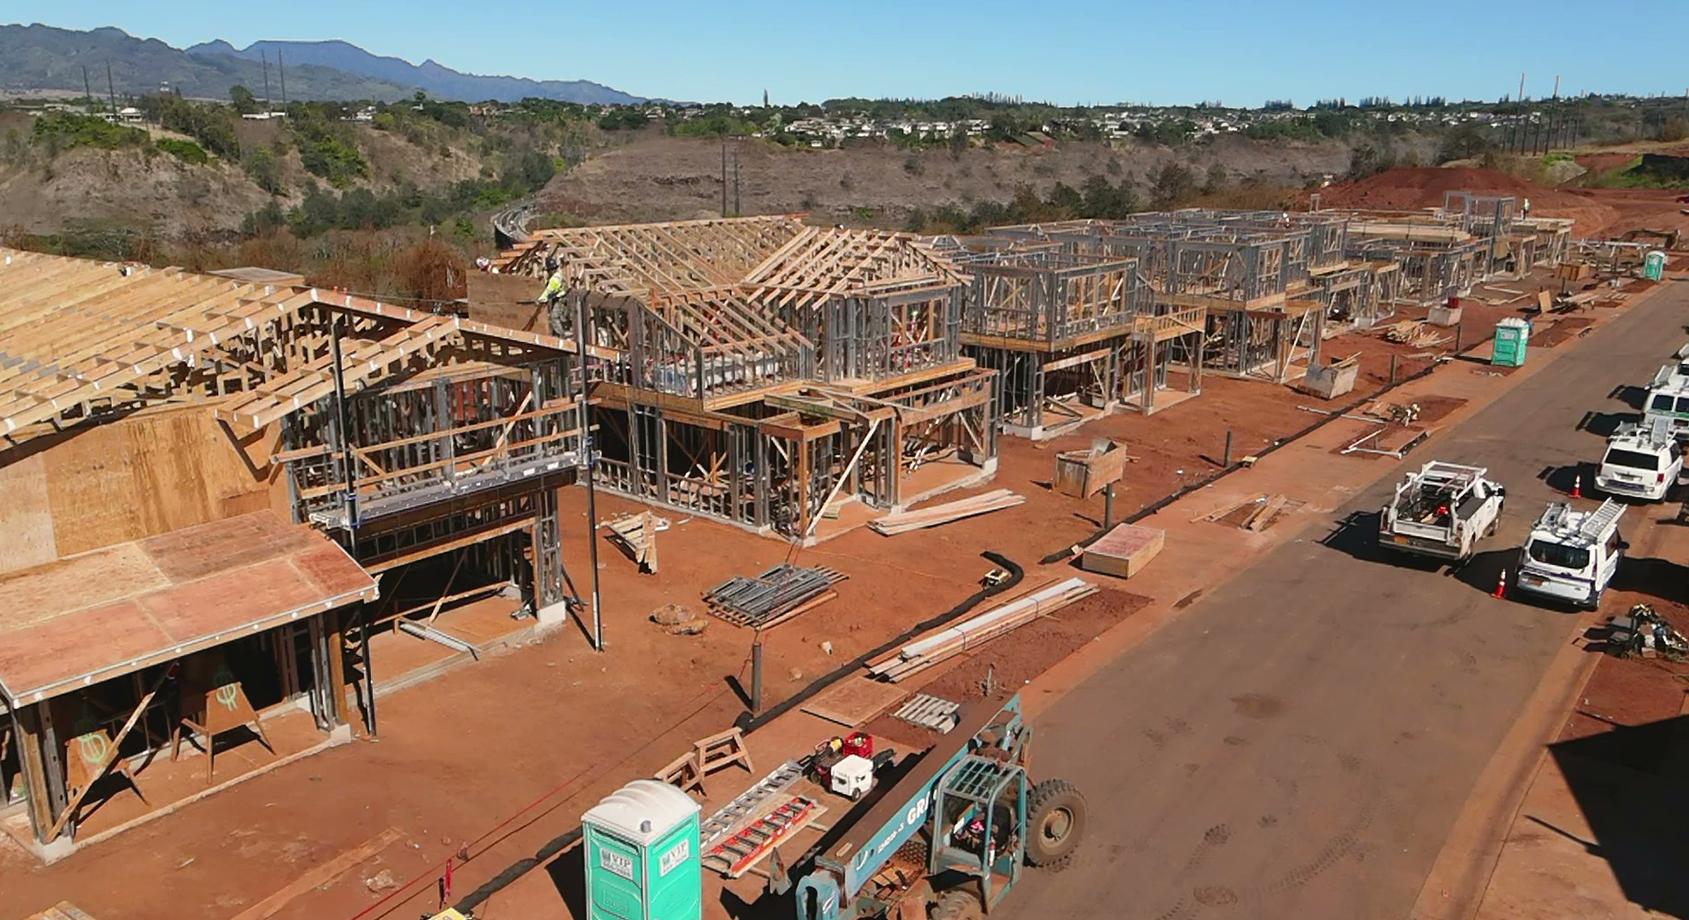 September 30 Nanea at Koa Ridge Phase 2 Construction